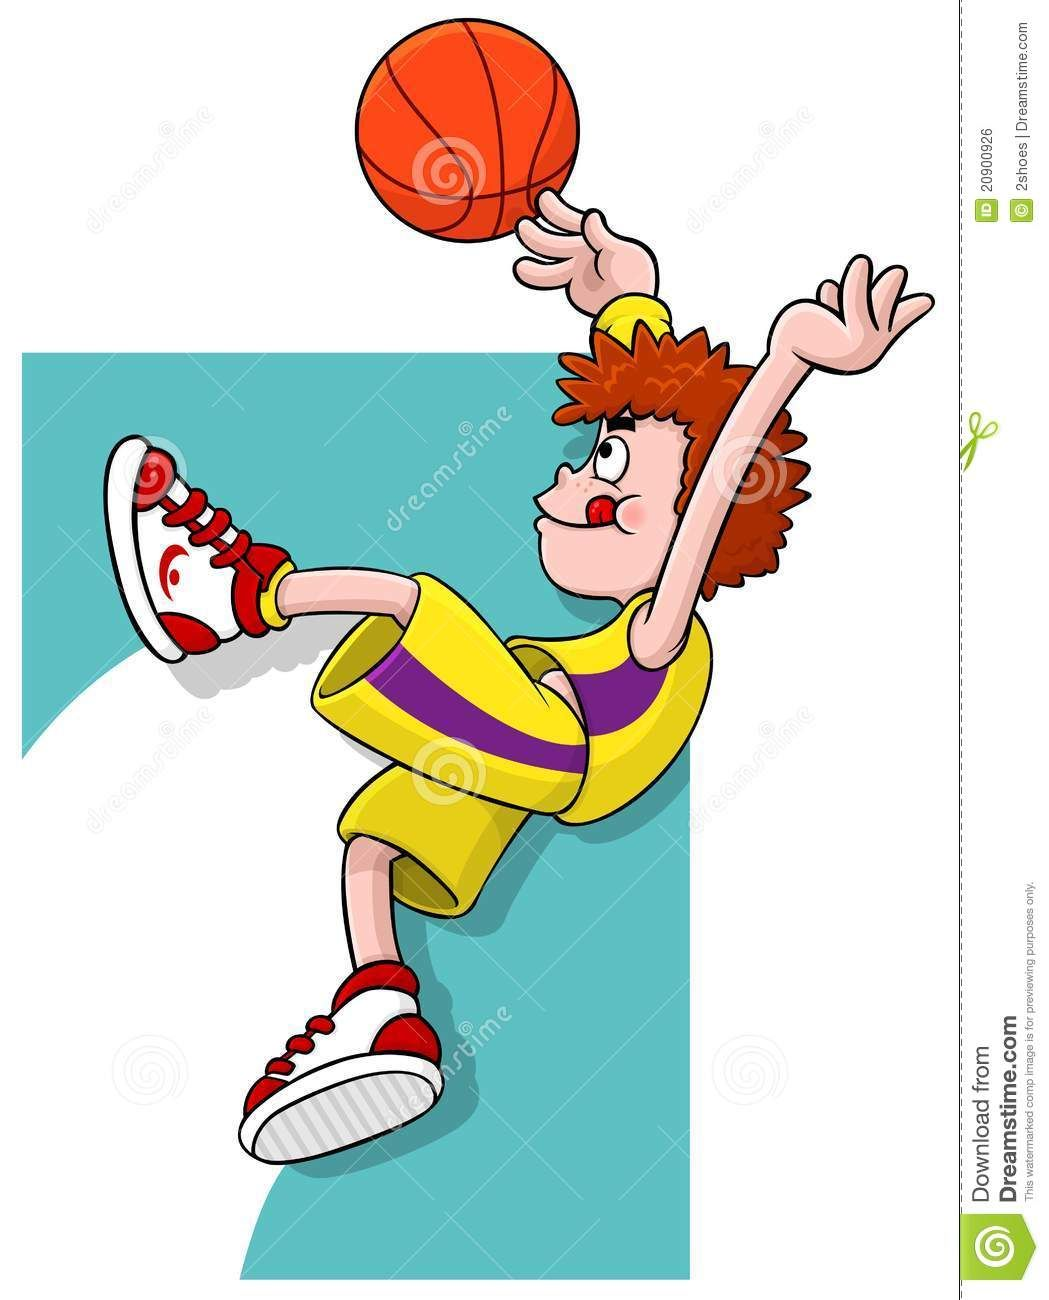 Cartoon Basketball Player Basketball Players Cartoon Players